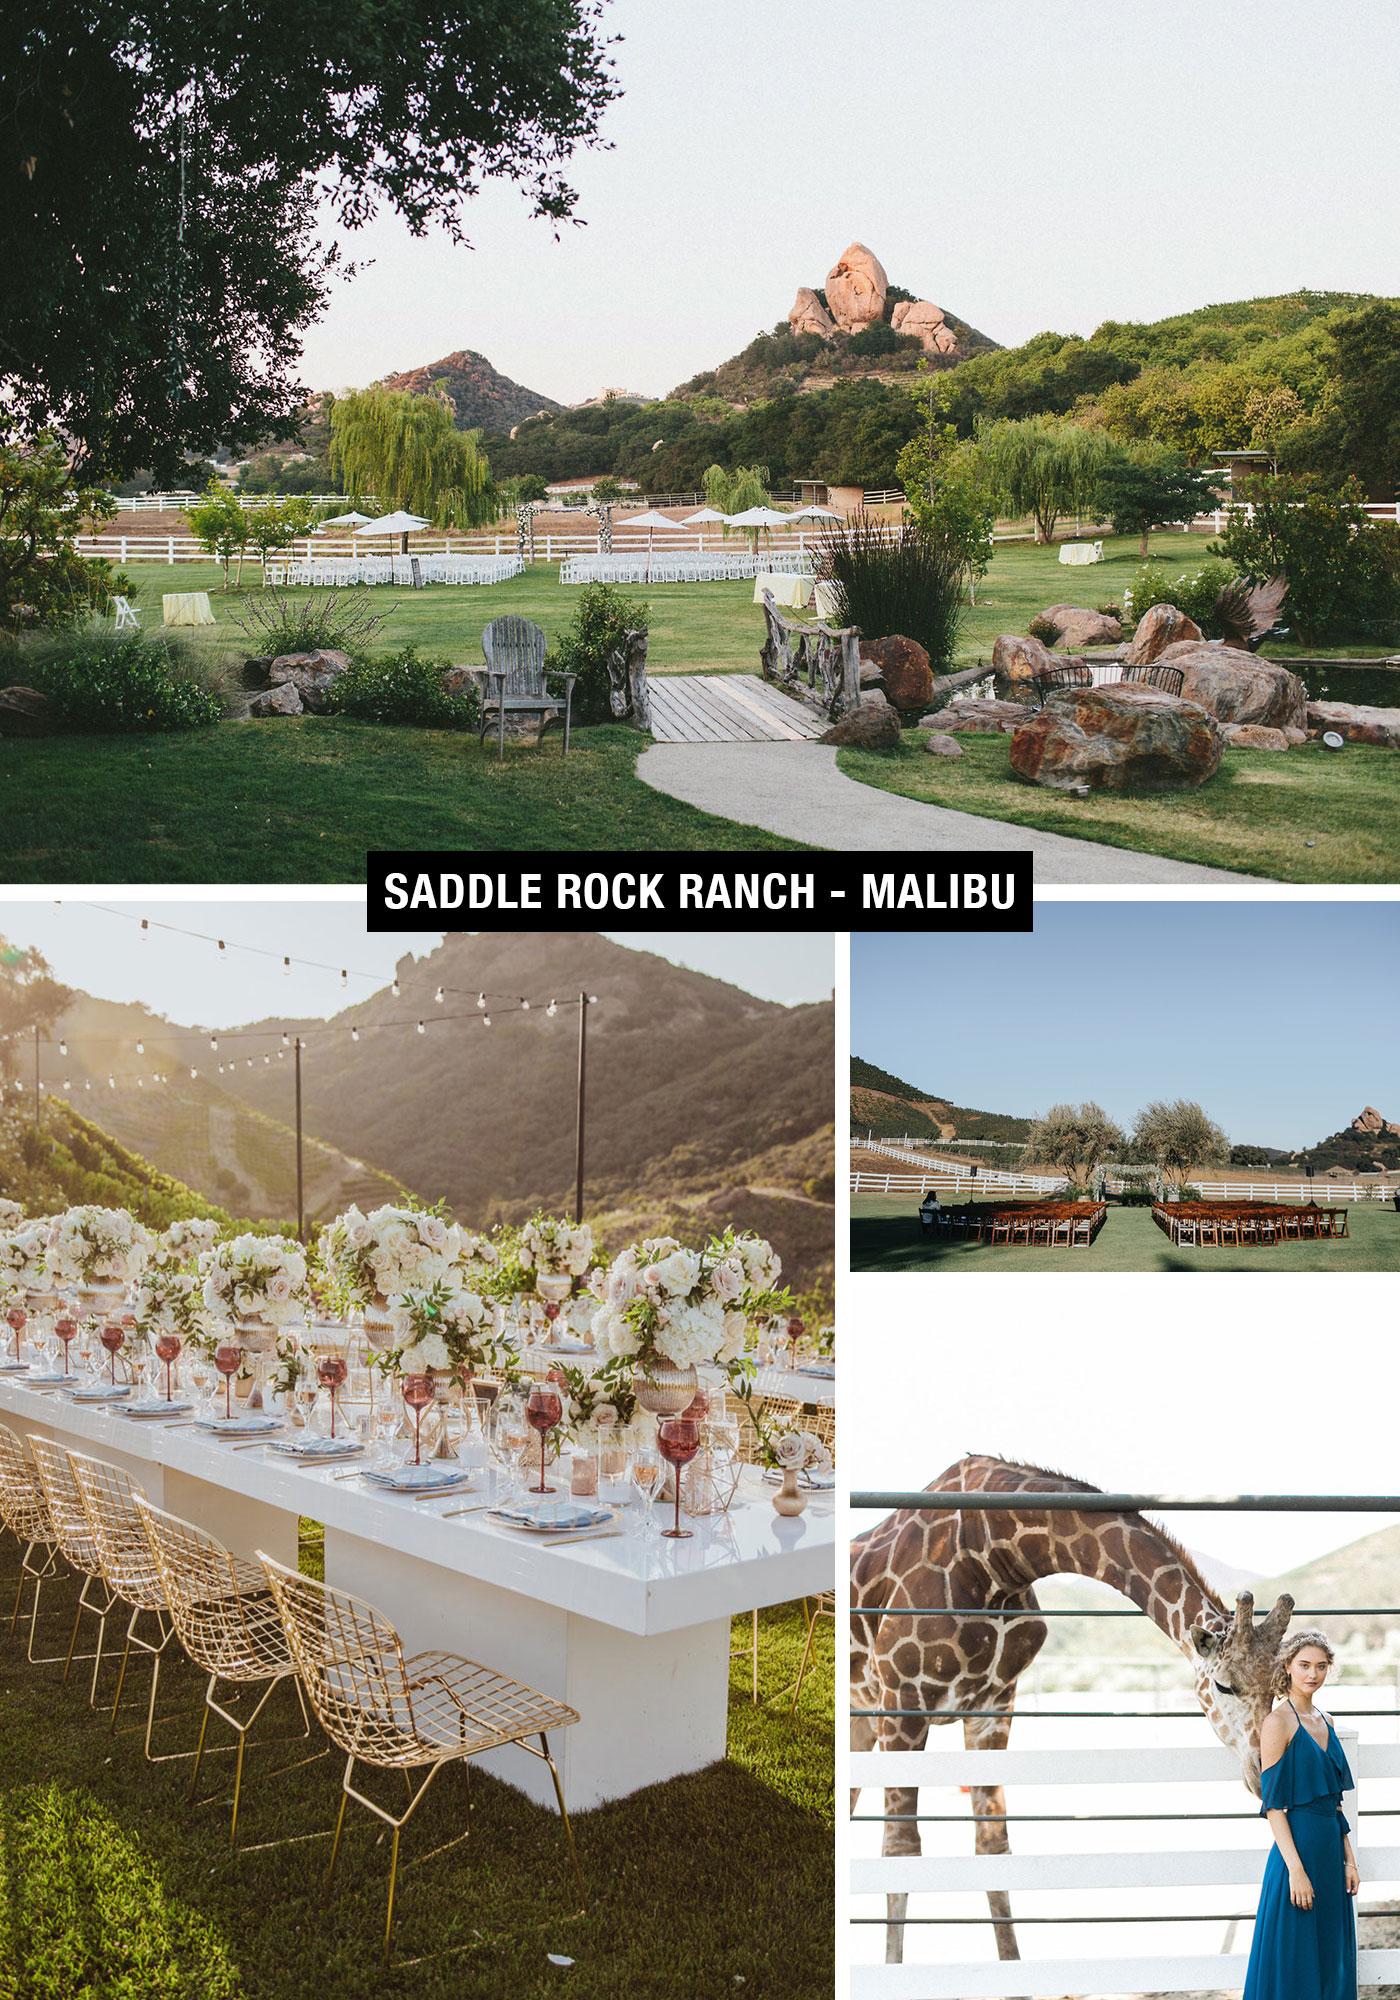 Saddle Rock Ranch in Malibu